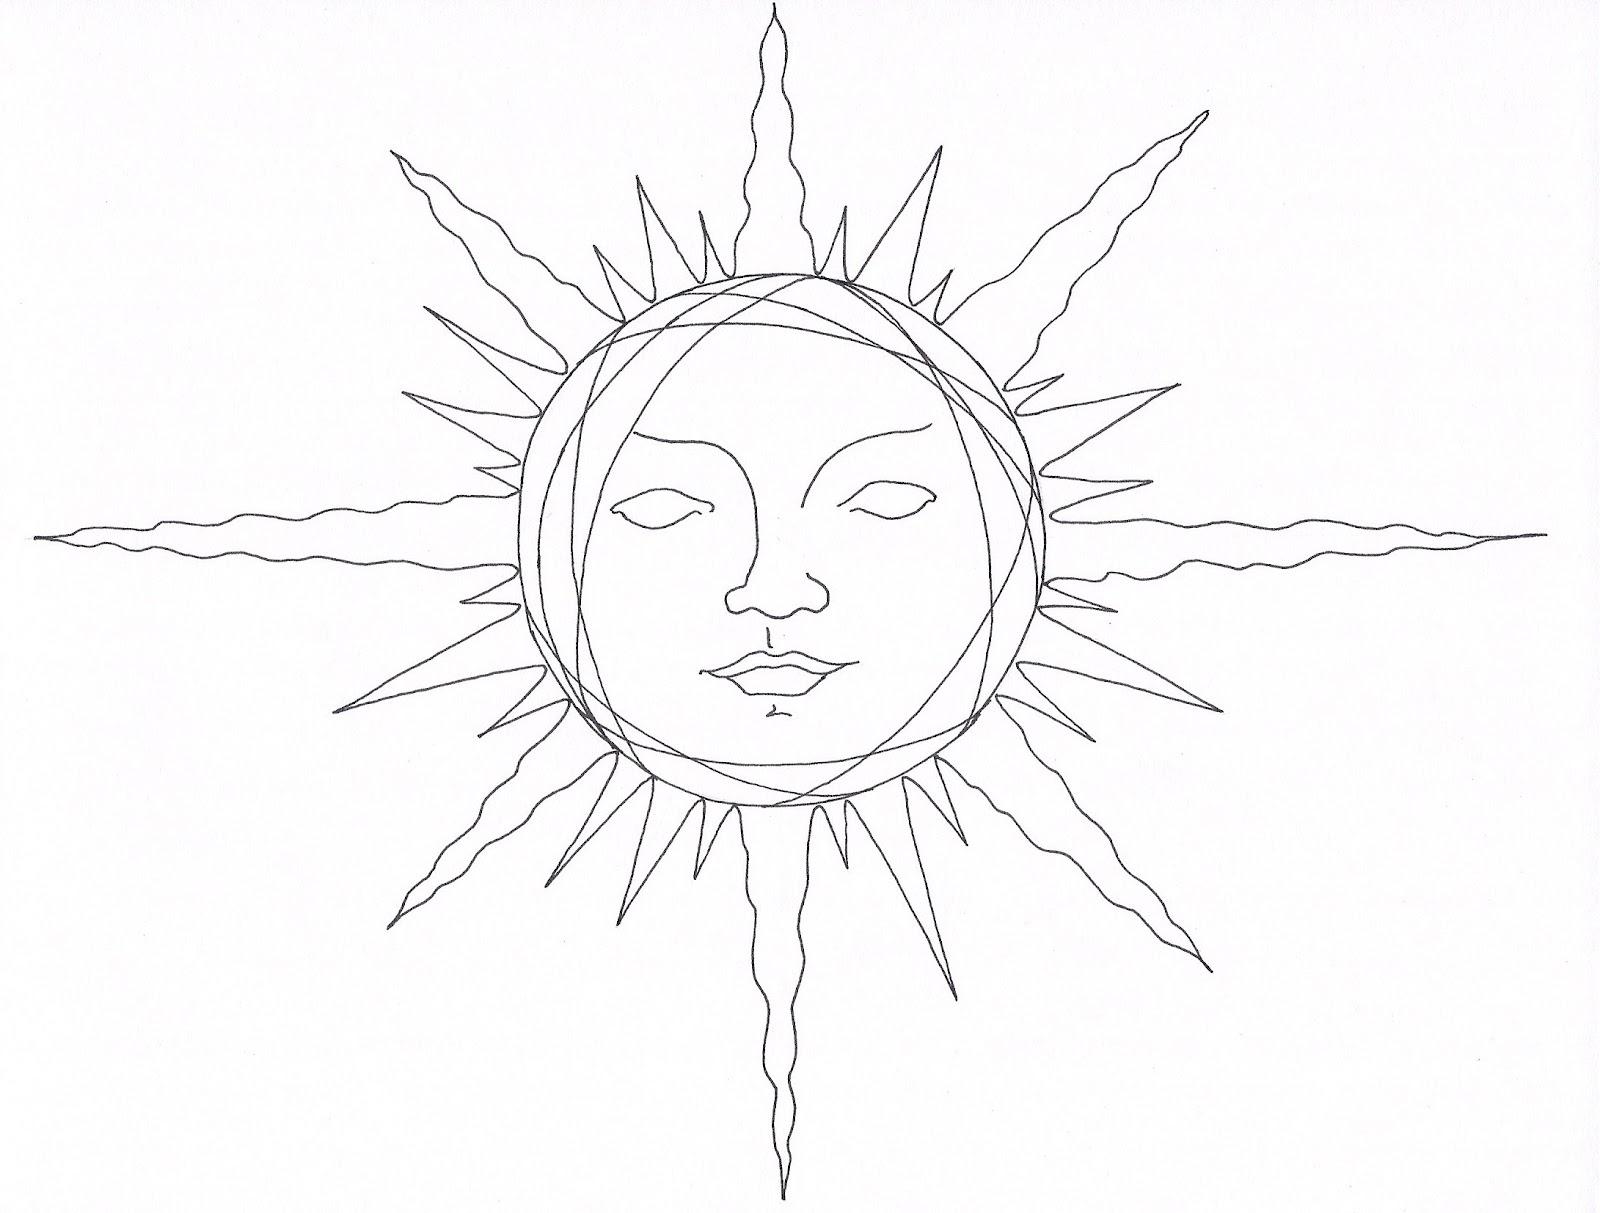 1600x1213 Pencil Drawings Of The Sun